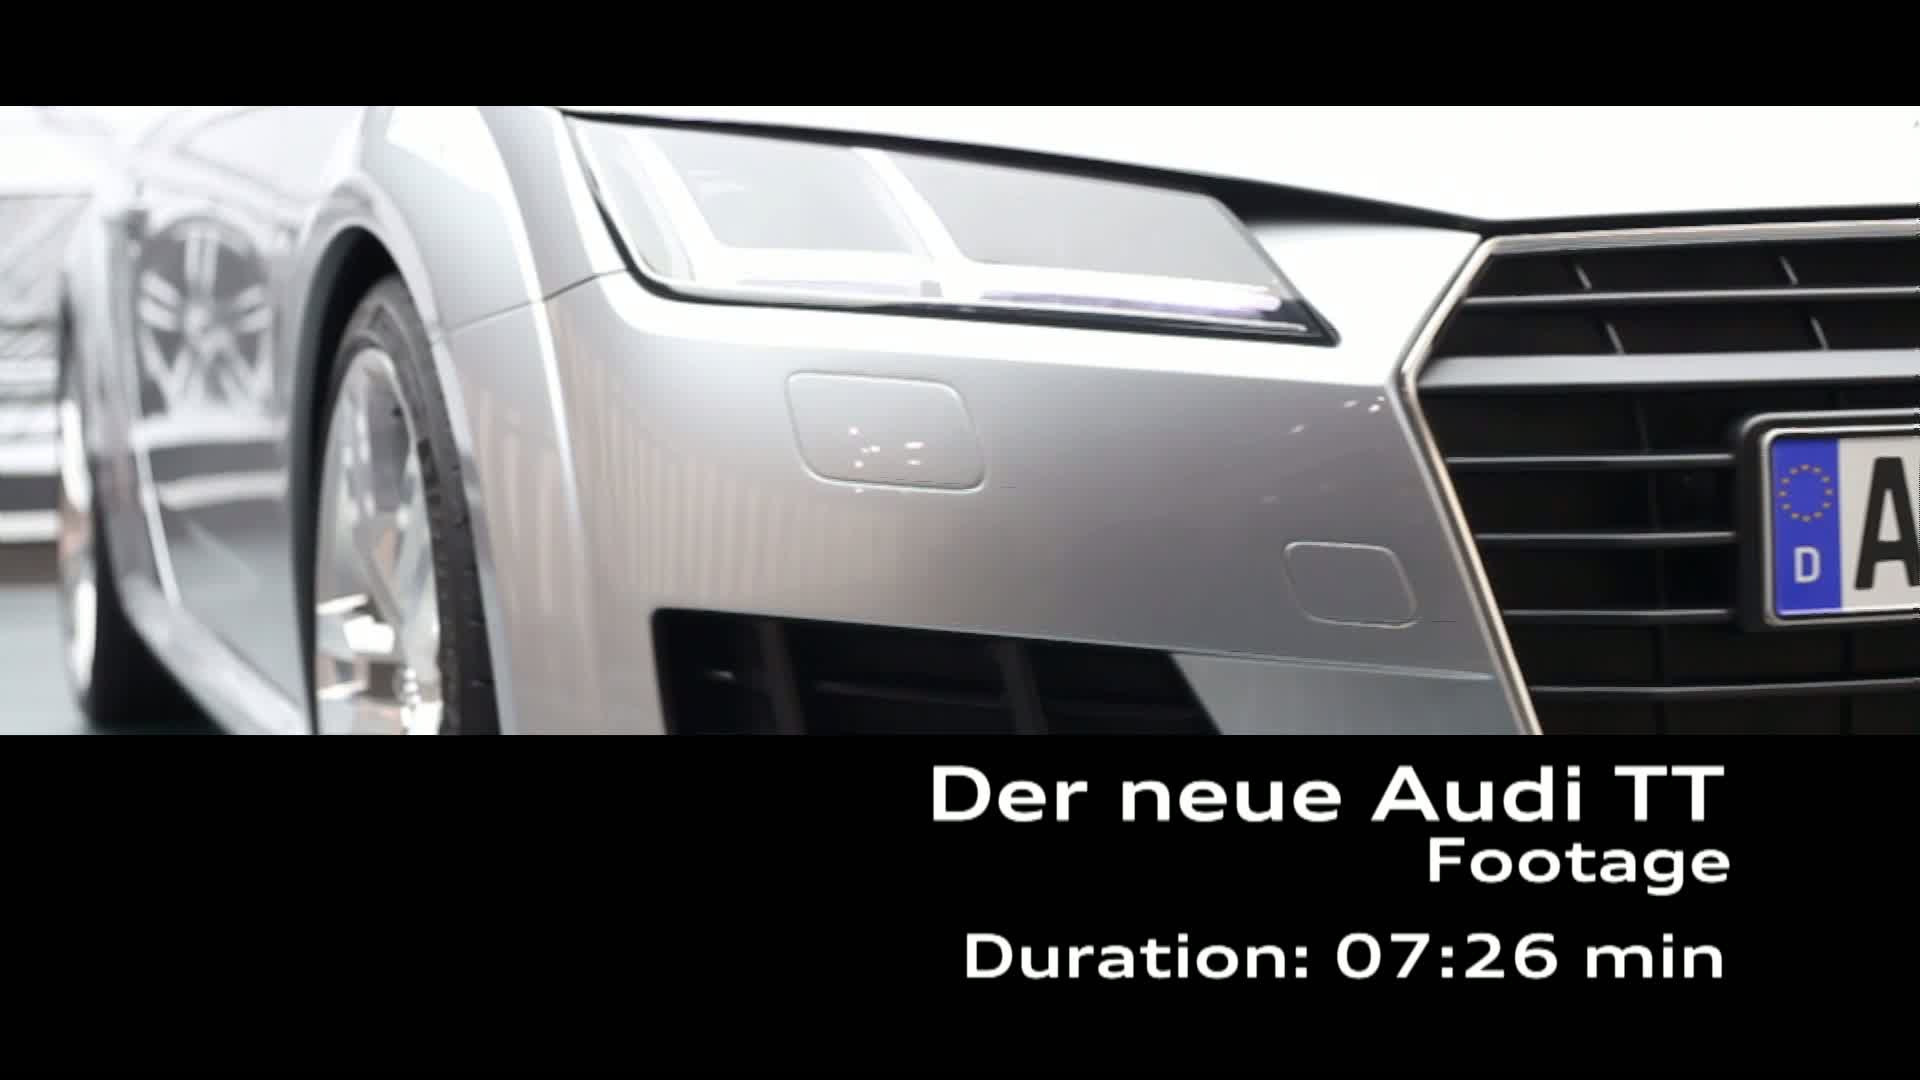 Audi TT Coupé und Audi TTS Coupé Design - Footage